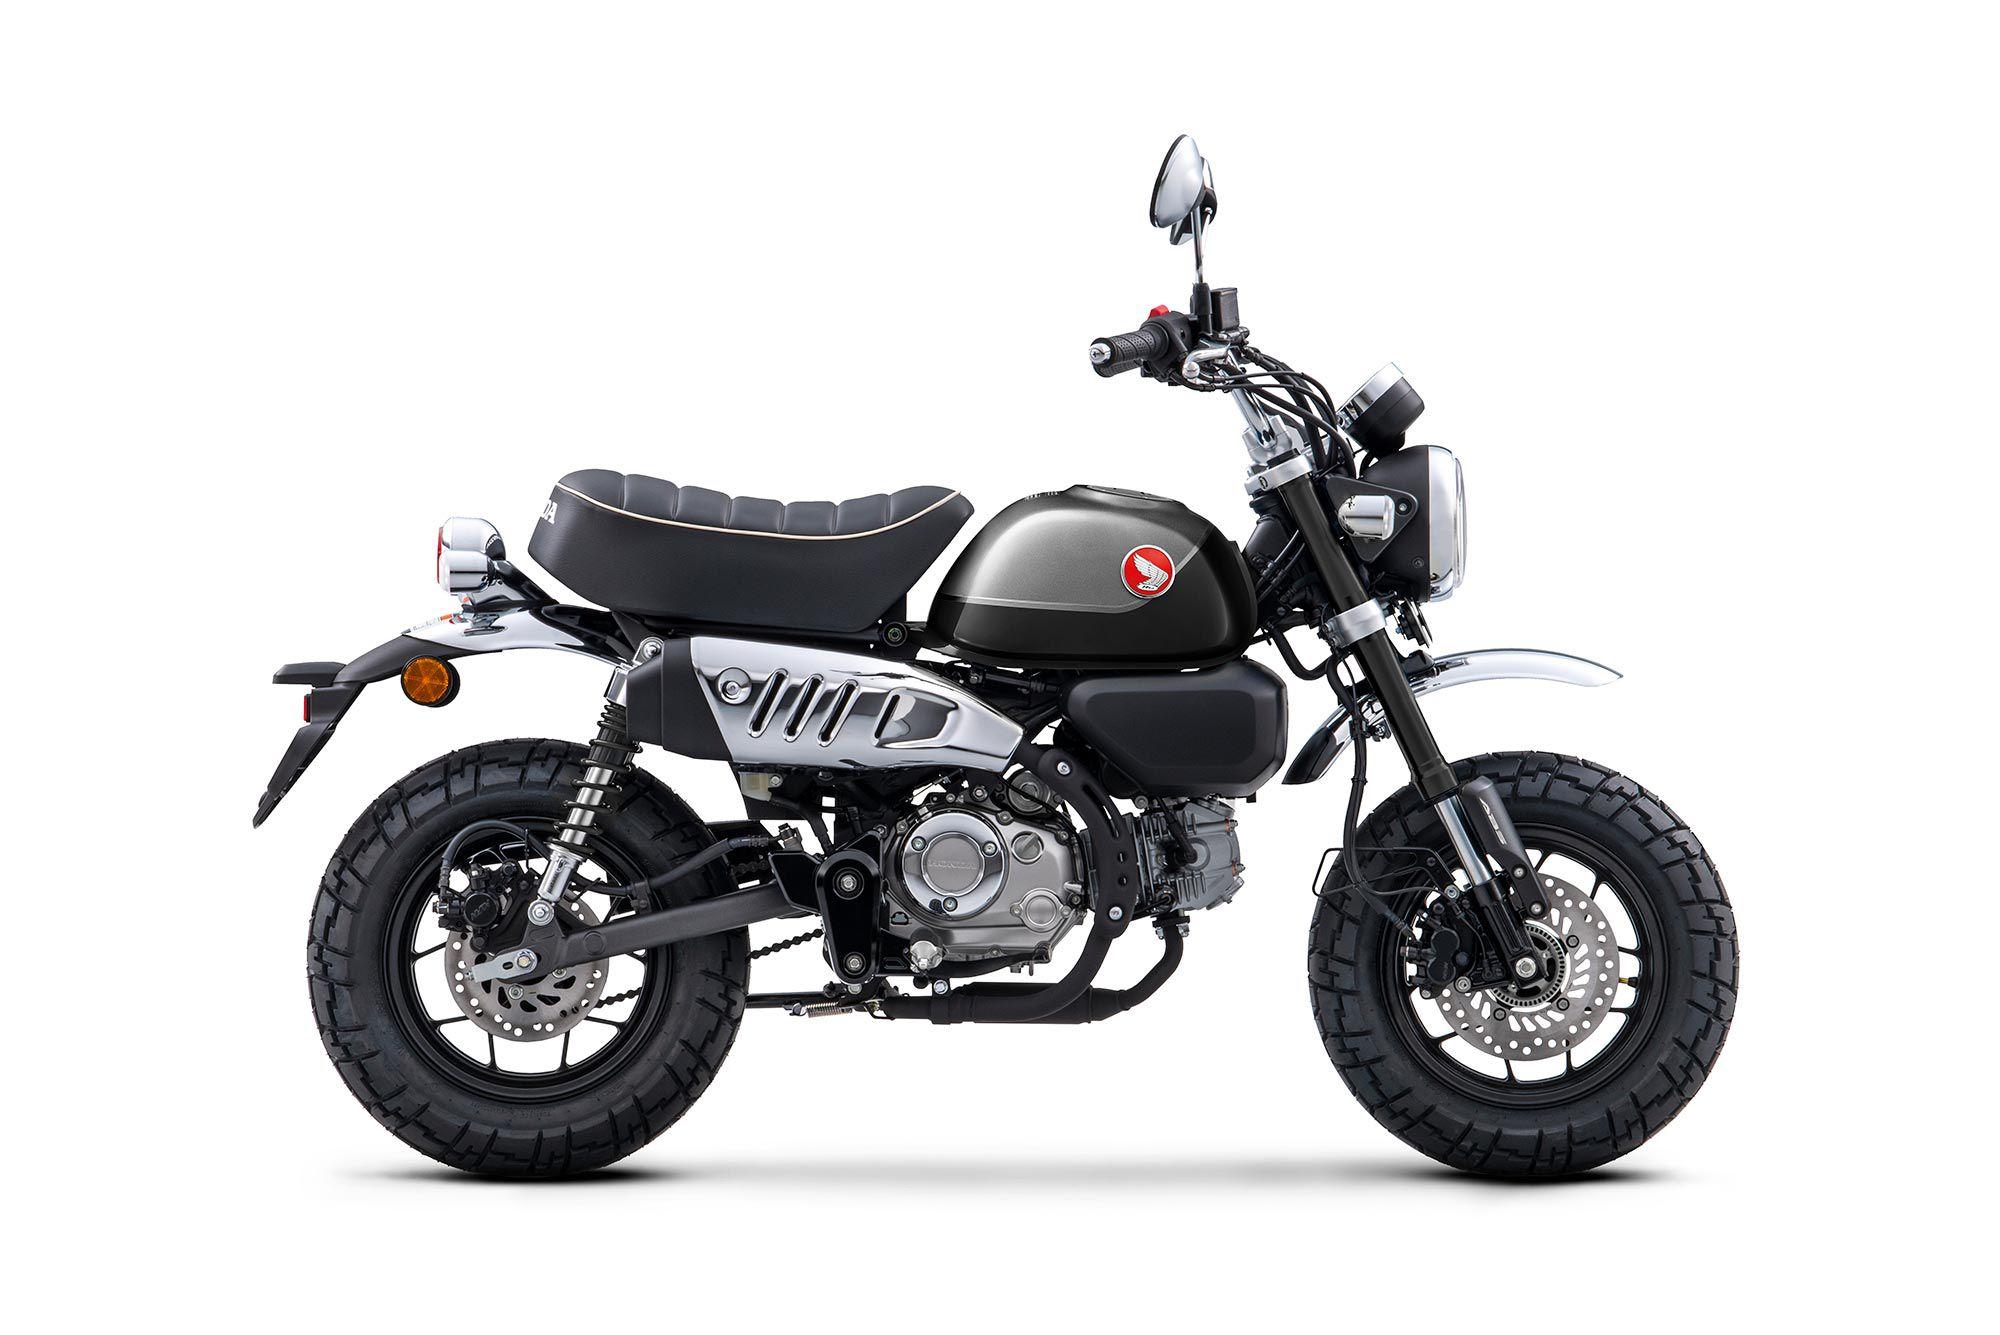 The 2022 Honda Monkey ABS in Pearl Black colorway.